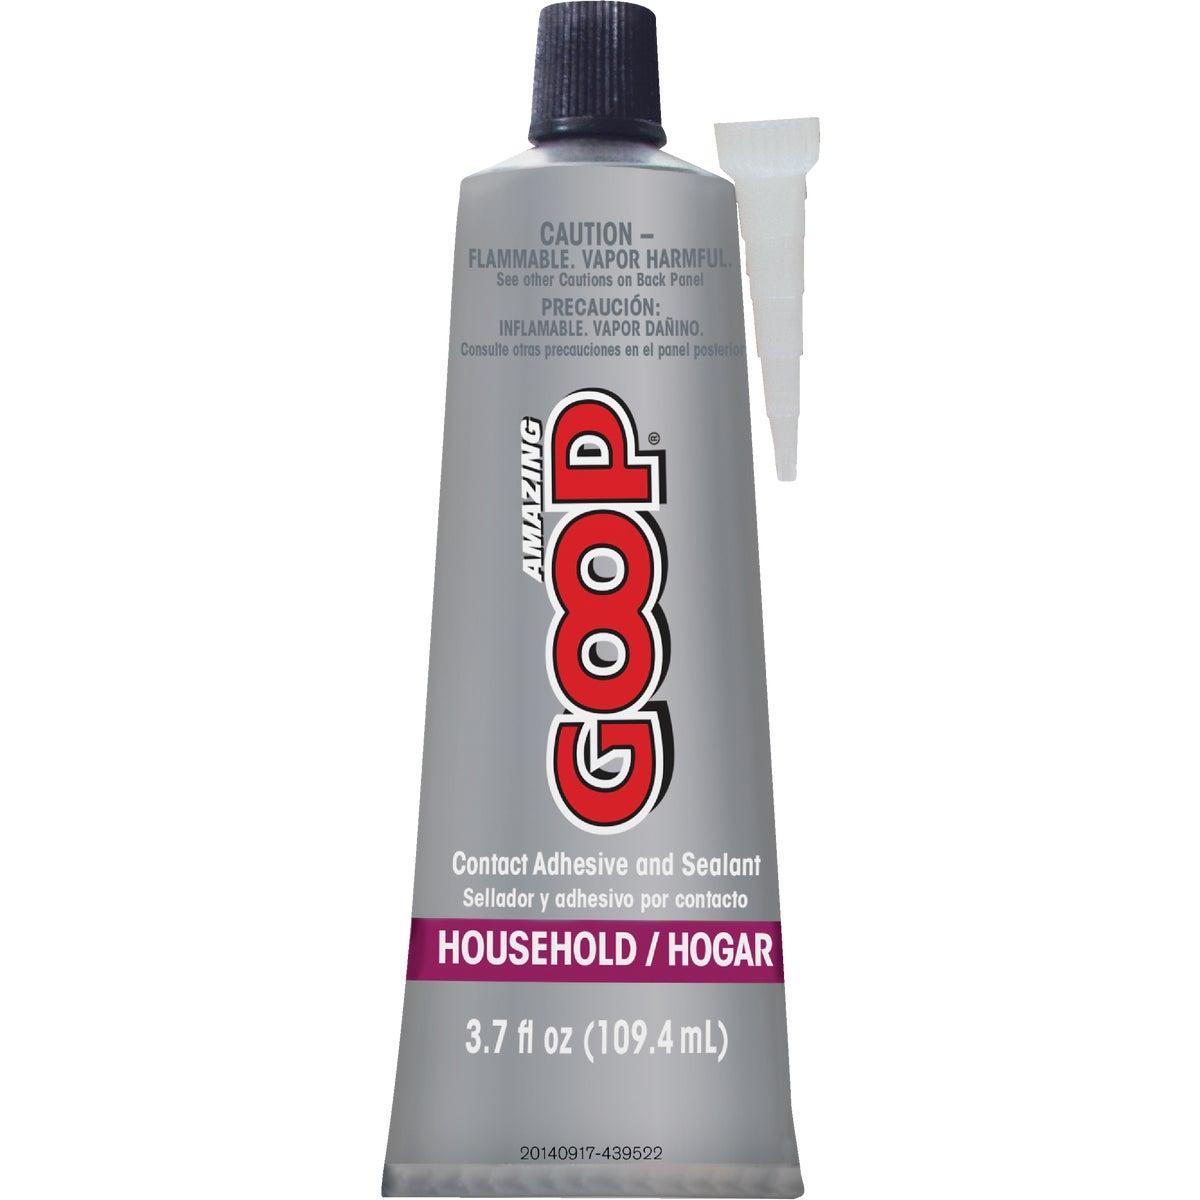 Eclectic Prod. 3.7OZ HOUSE GOOP GLUE 130016